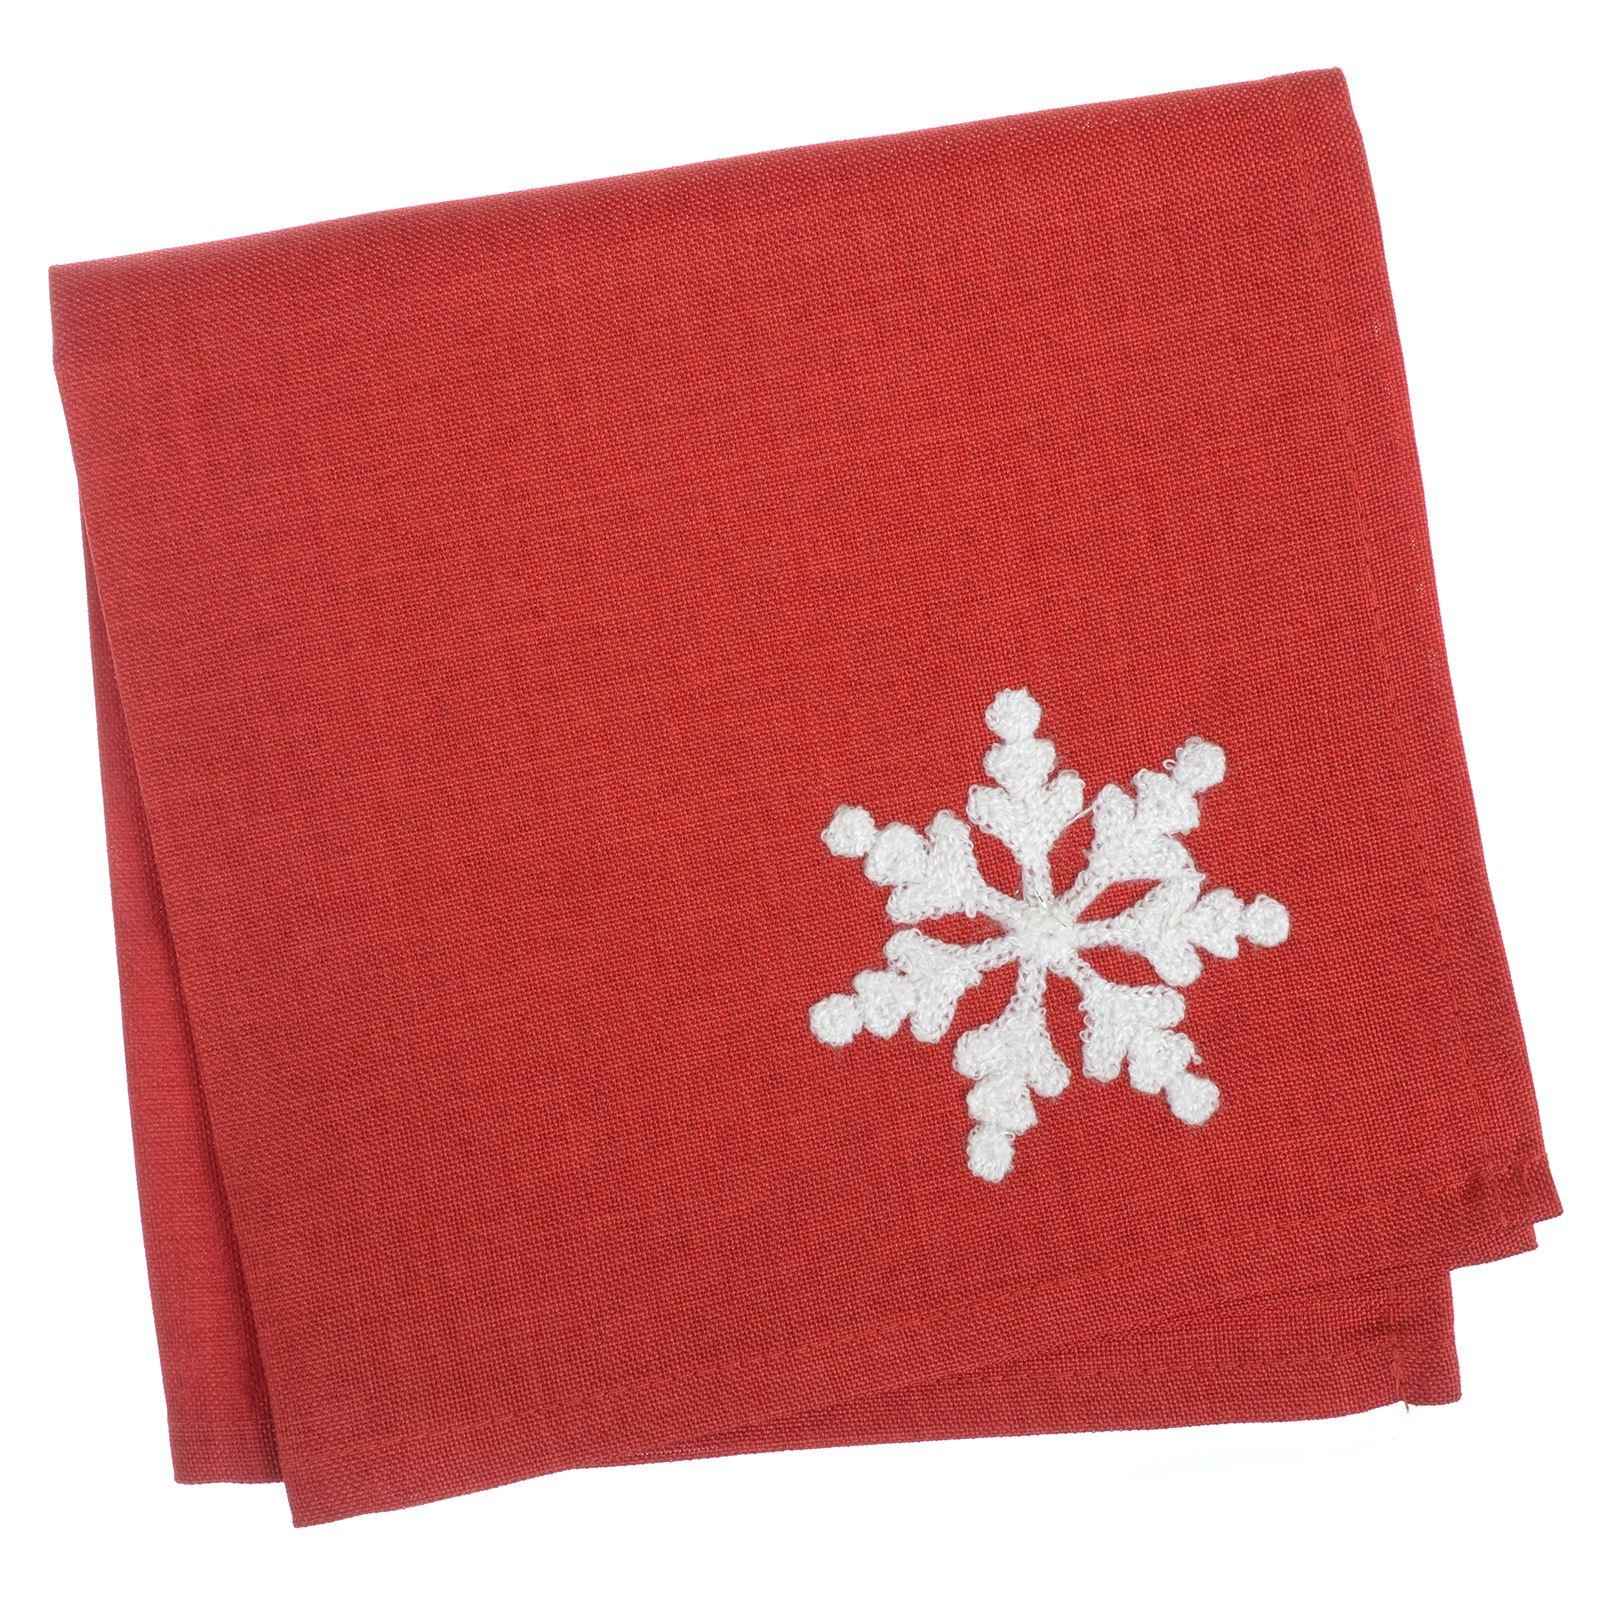 Christmas-Tablecloth-Festive-Pattern-Rectangle-Round-Fabric-Xmas-Room-Decoration Indexbild 109